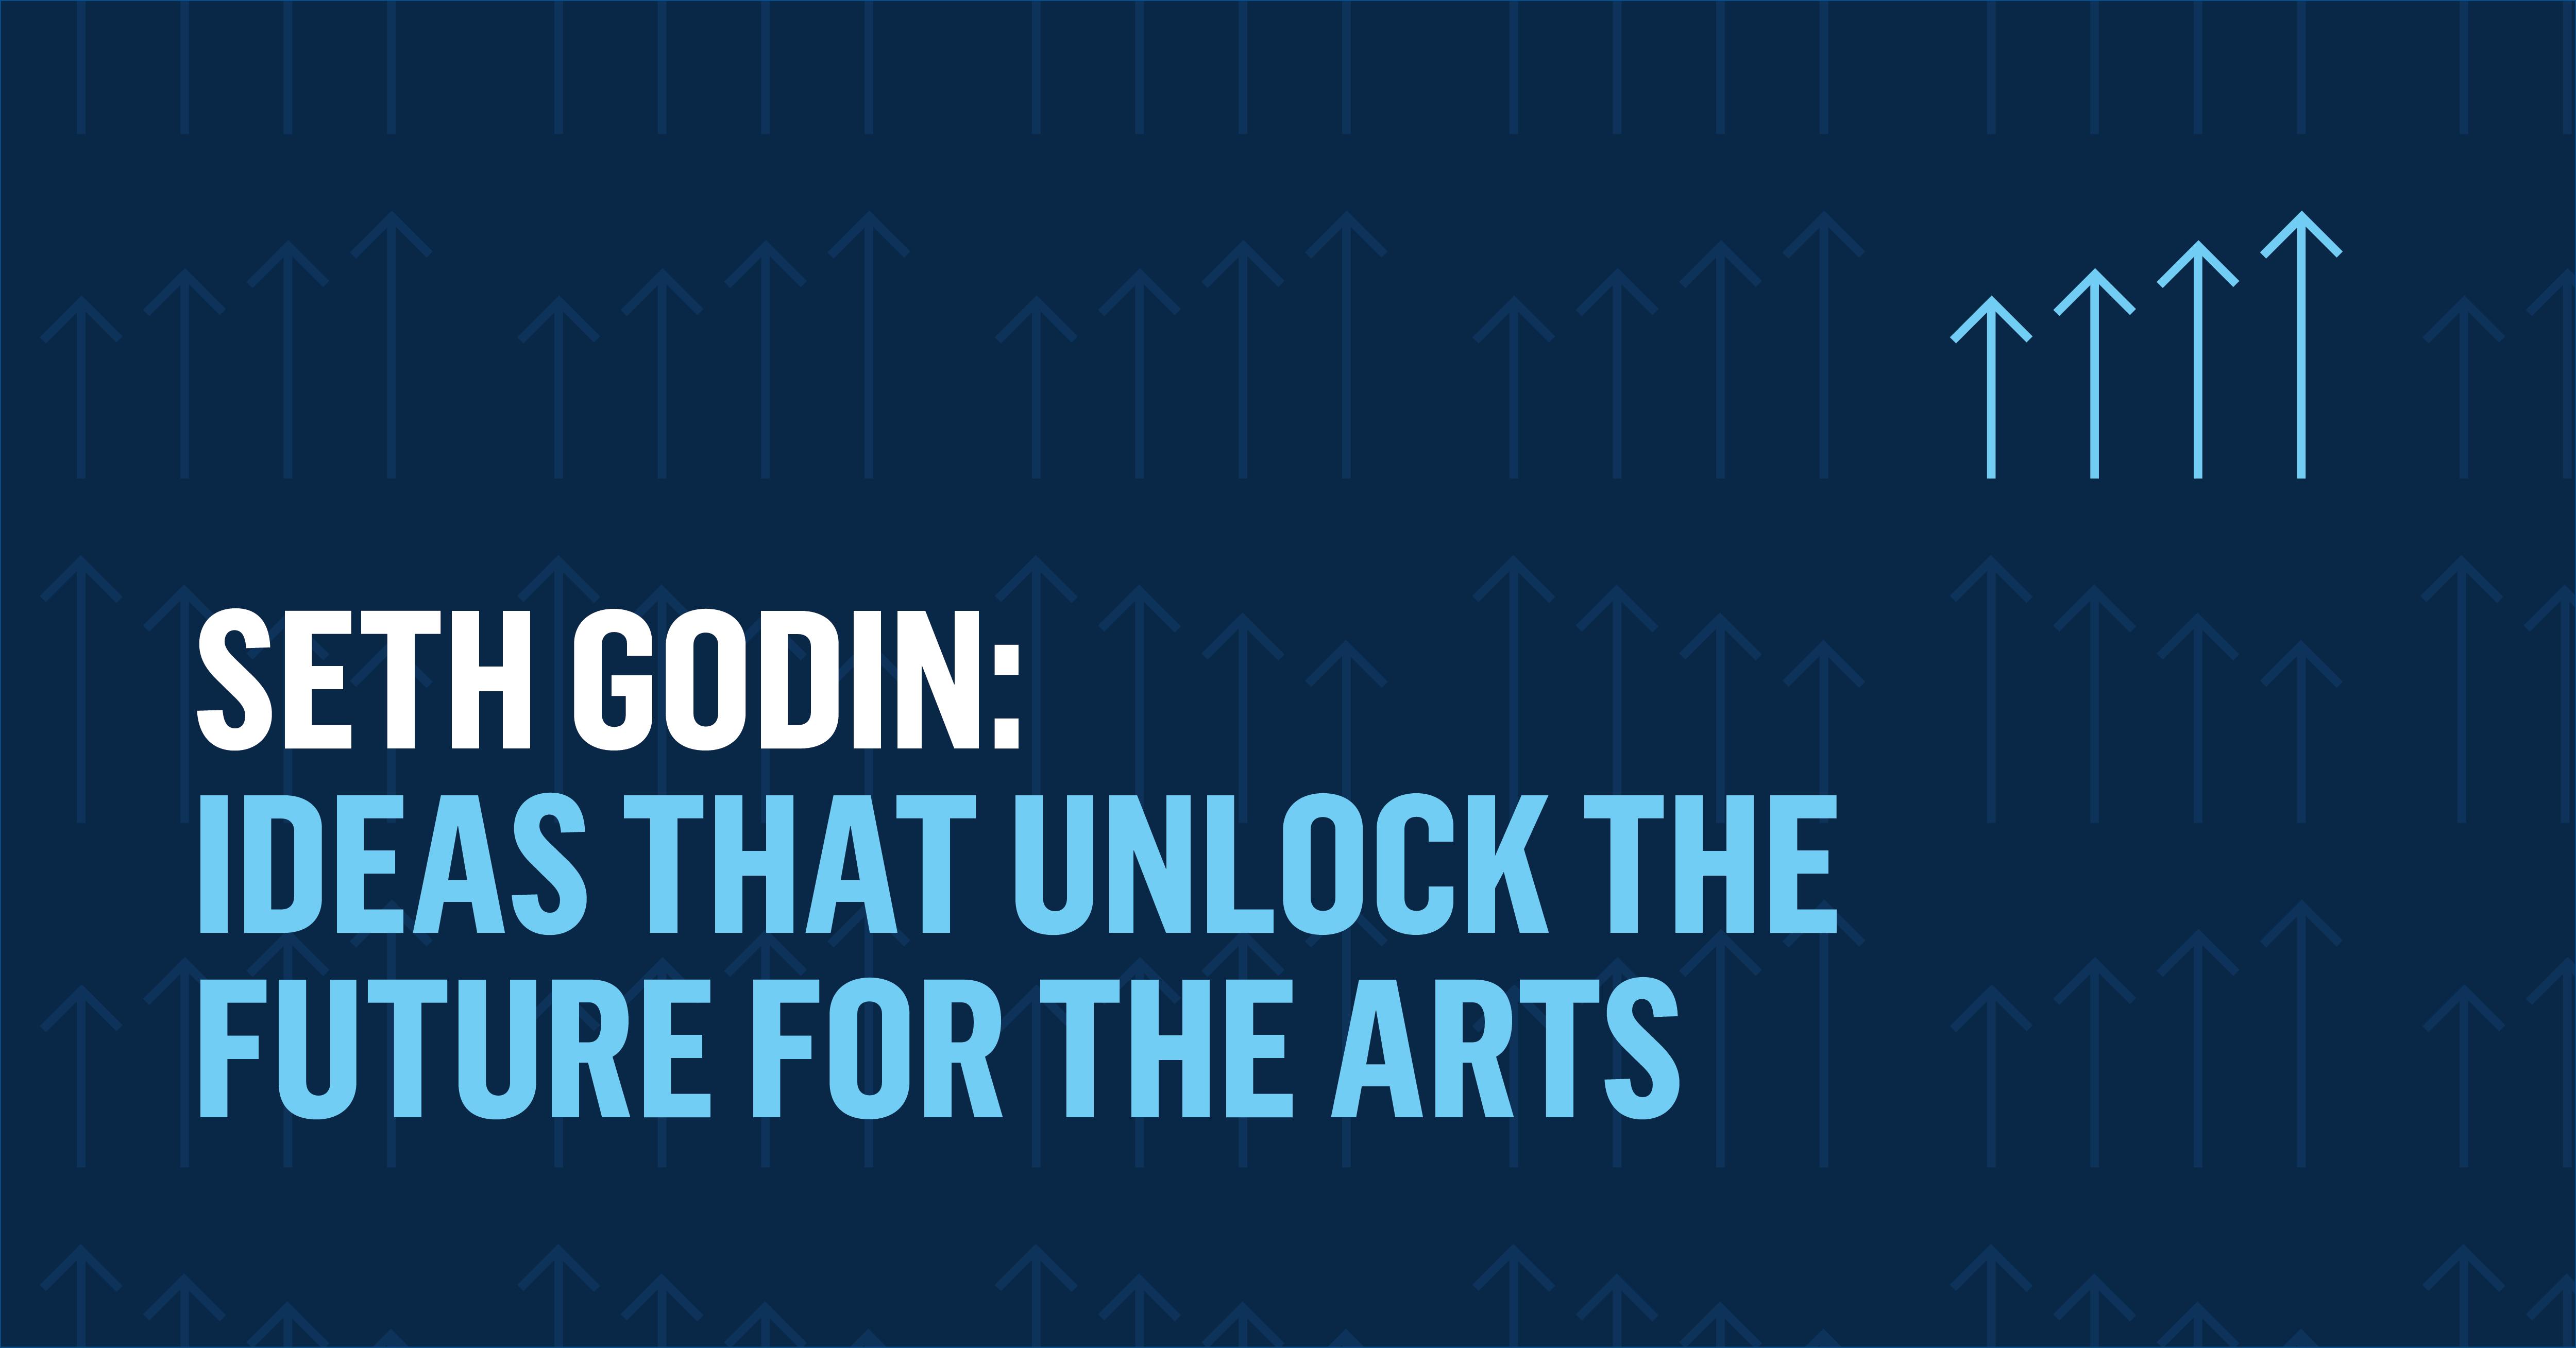 Seth Godin: Ideas That Unlock the Future for the Arts